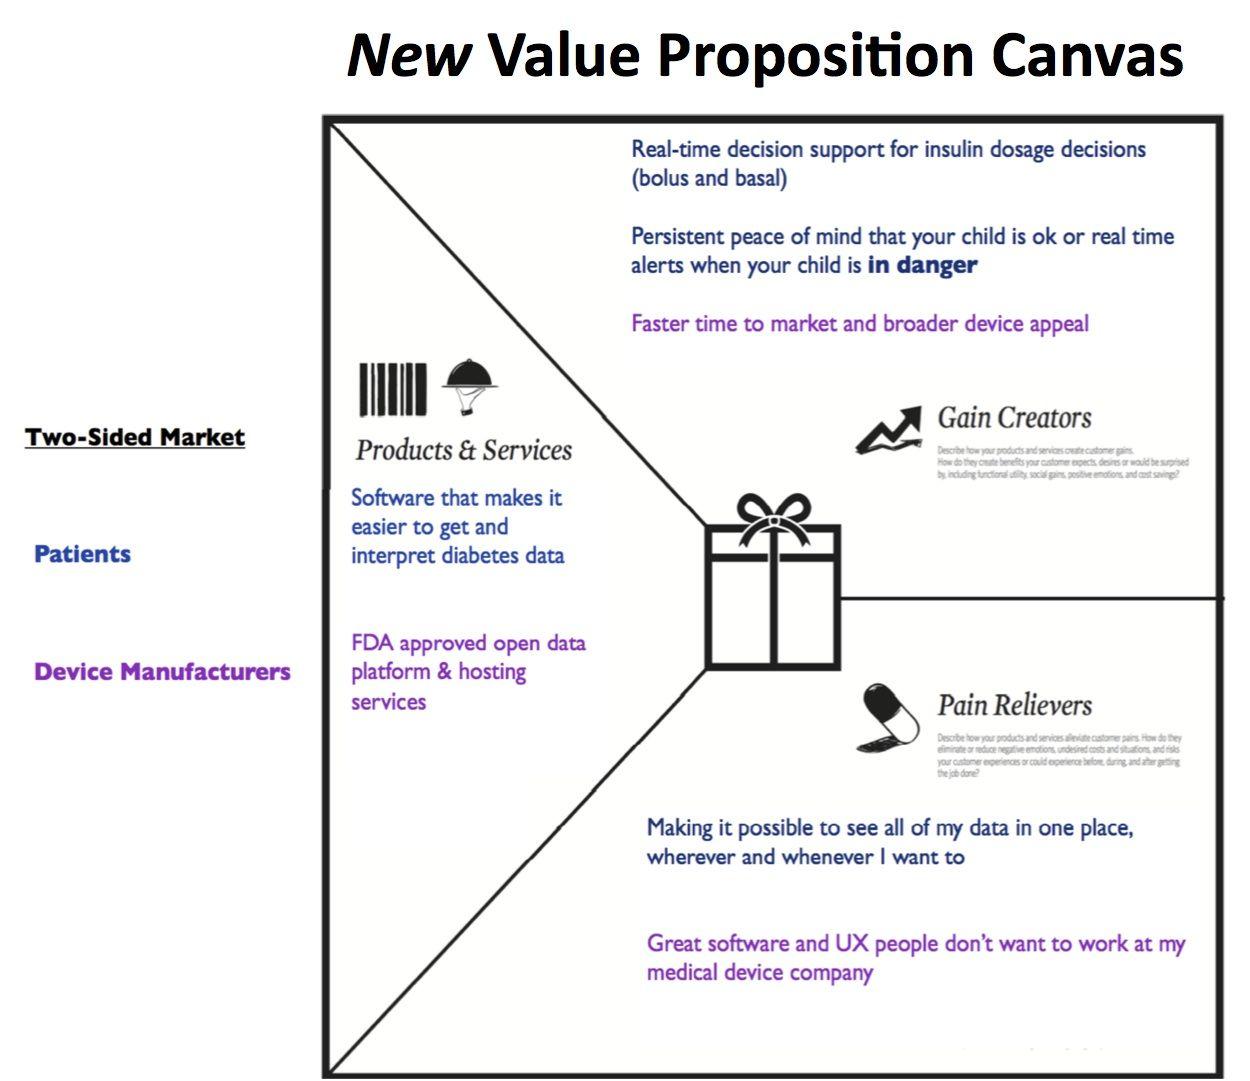 S Thoughtleadershipzenspot Thoughtleadership Customer Development Manifesto